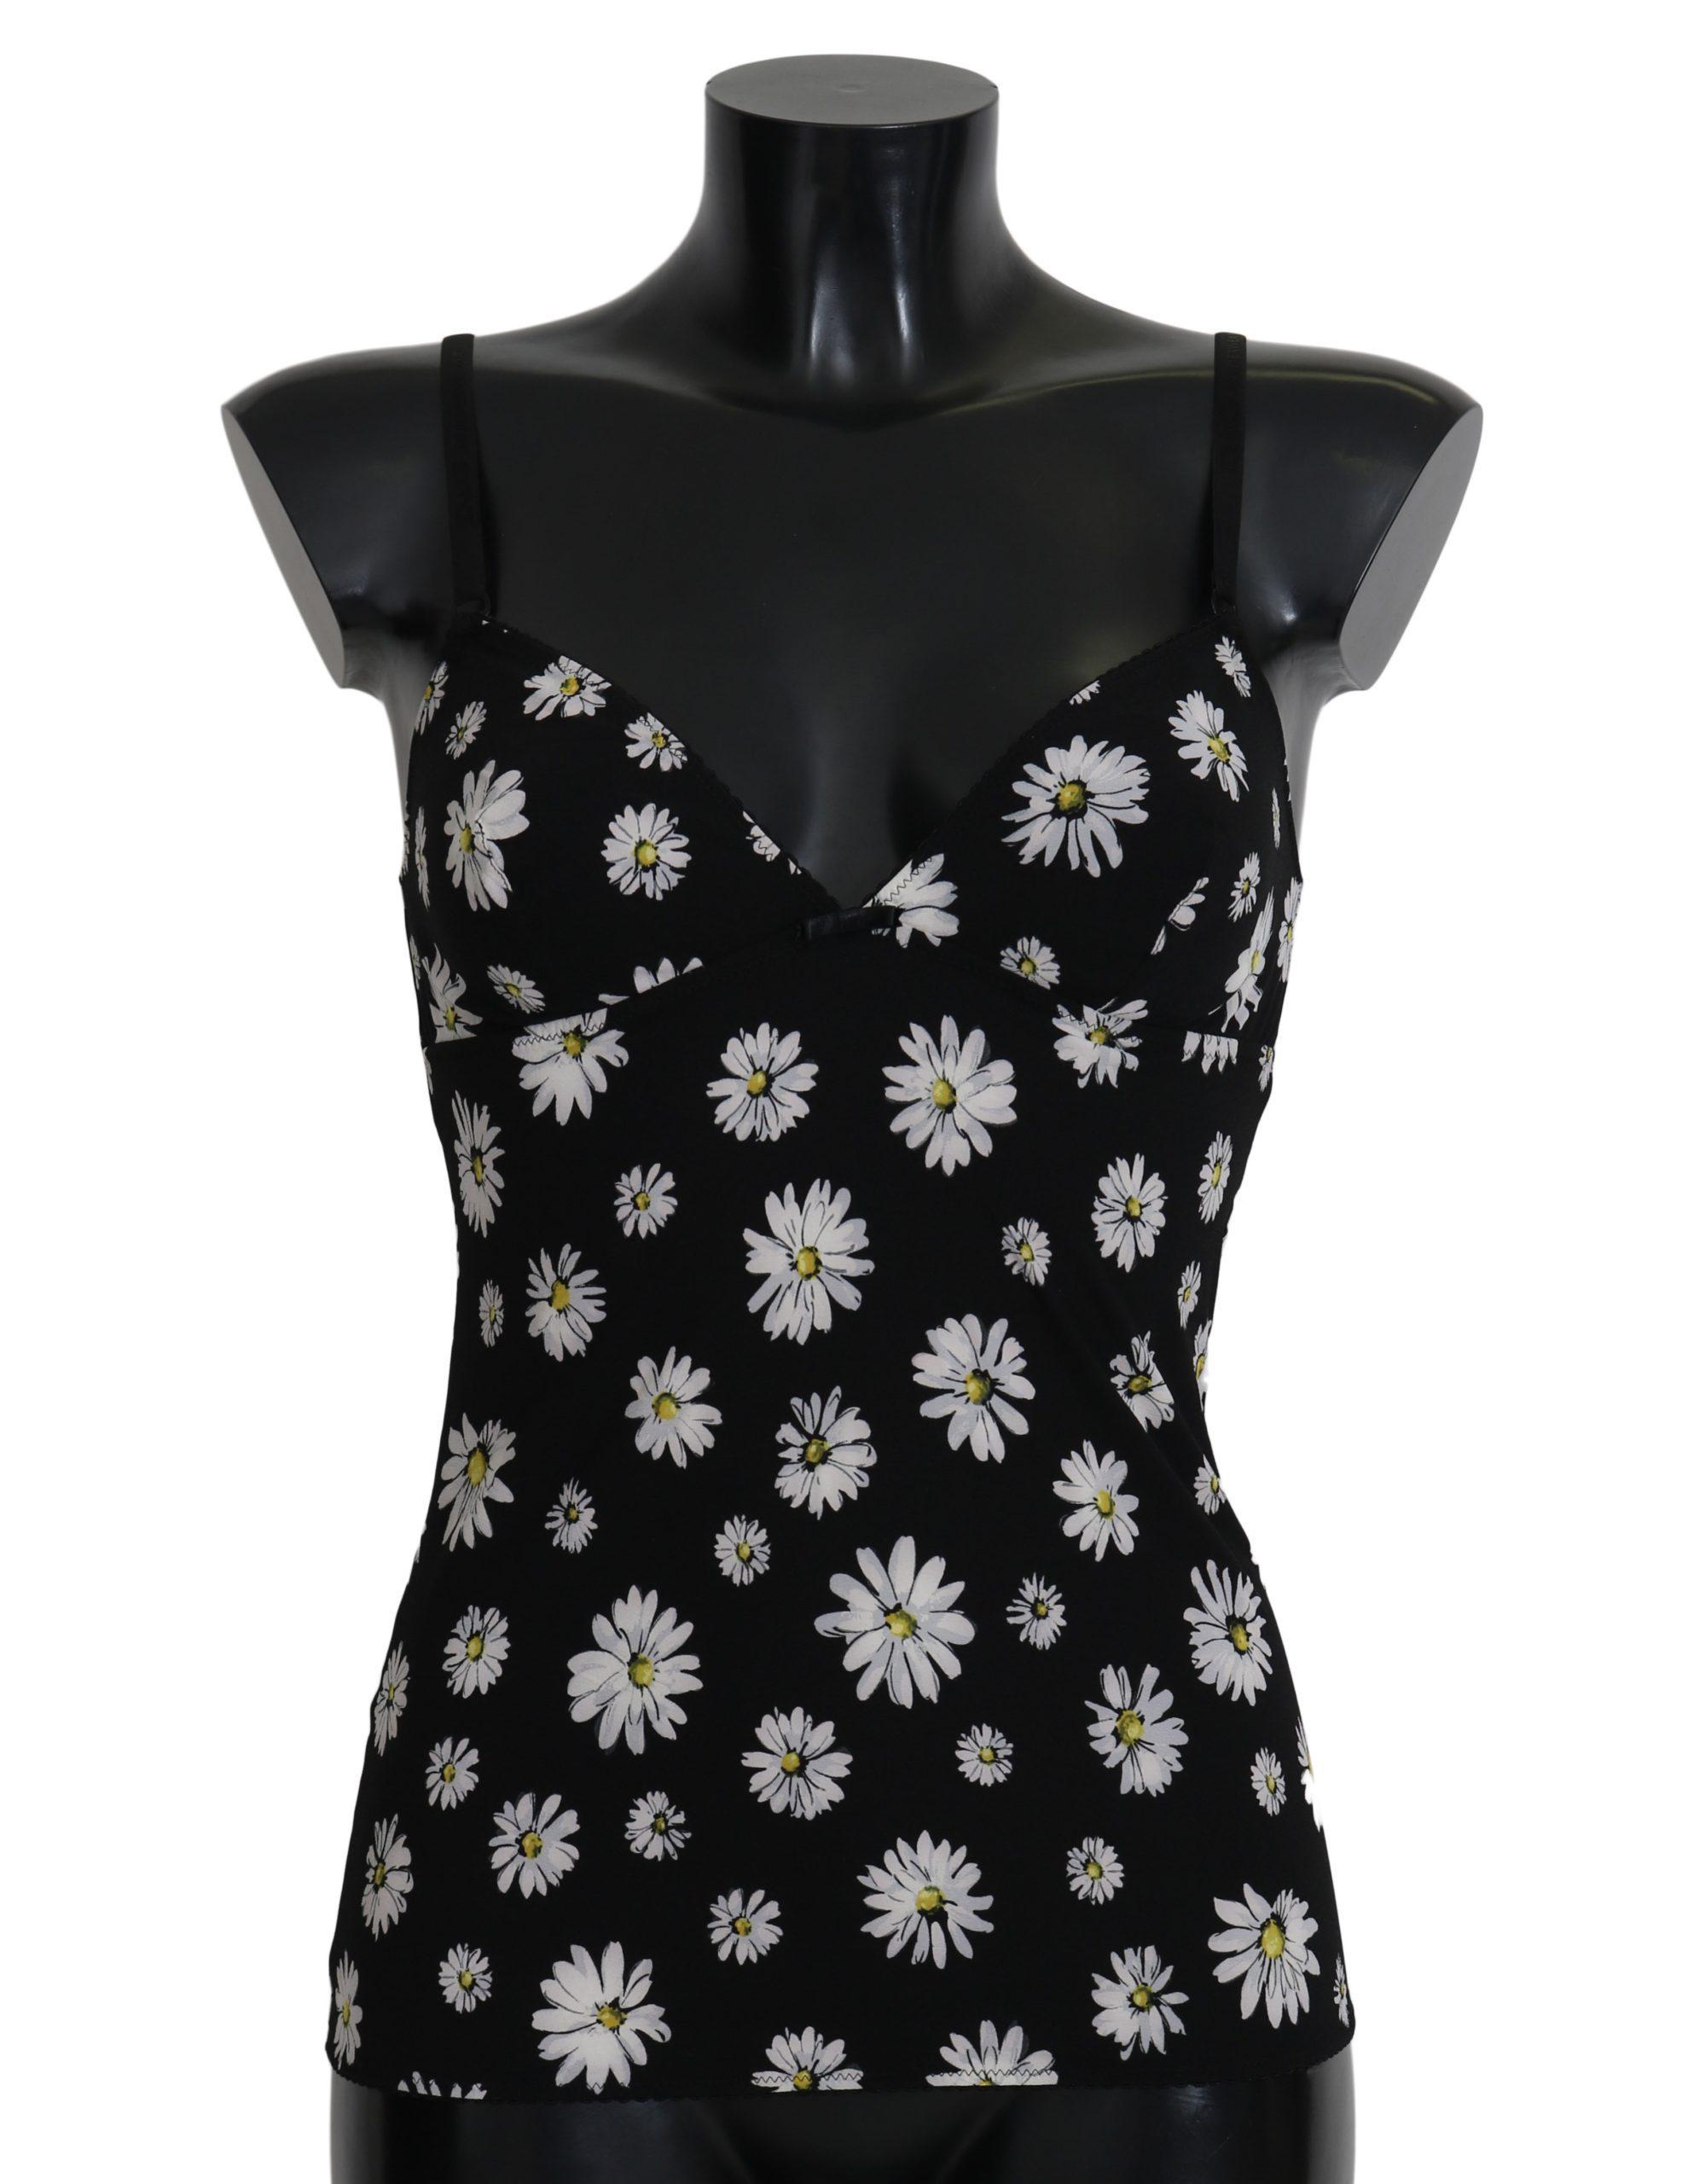 Dolce & Gabbana Women's Dress Black BIK273 - IT2 | S